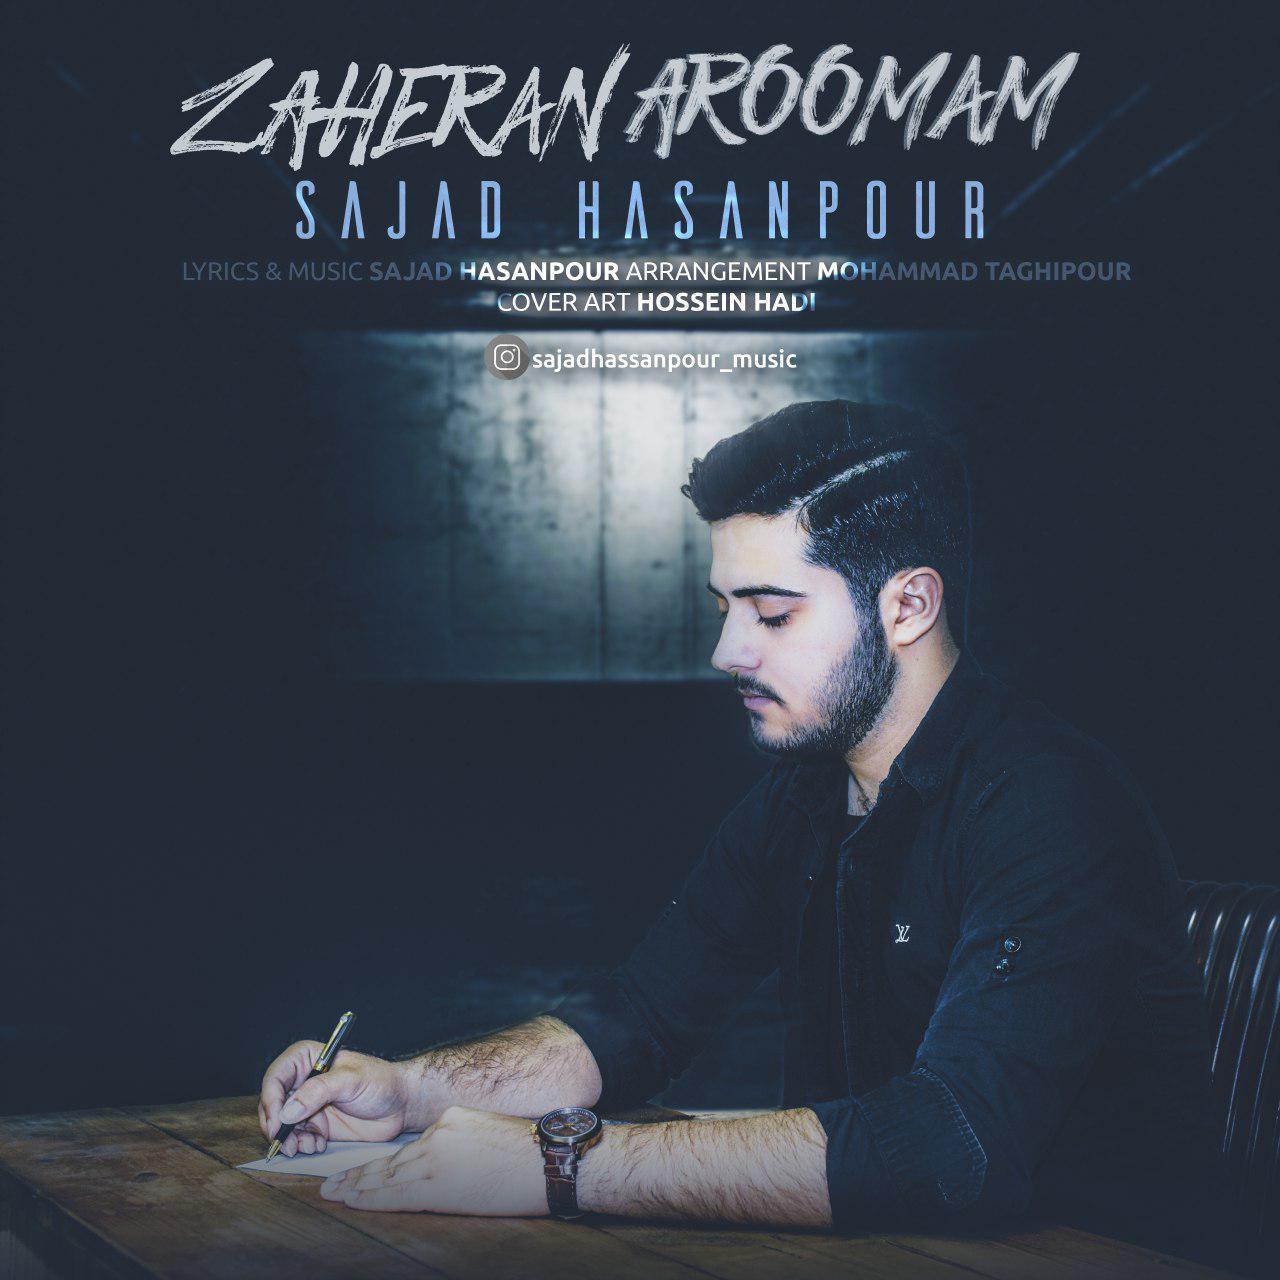 Sajad Hasanpour - Zaheran Aroomam Music   آهنگ سجاد حسن پور - ظاهرا آرومم